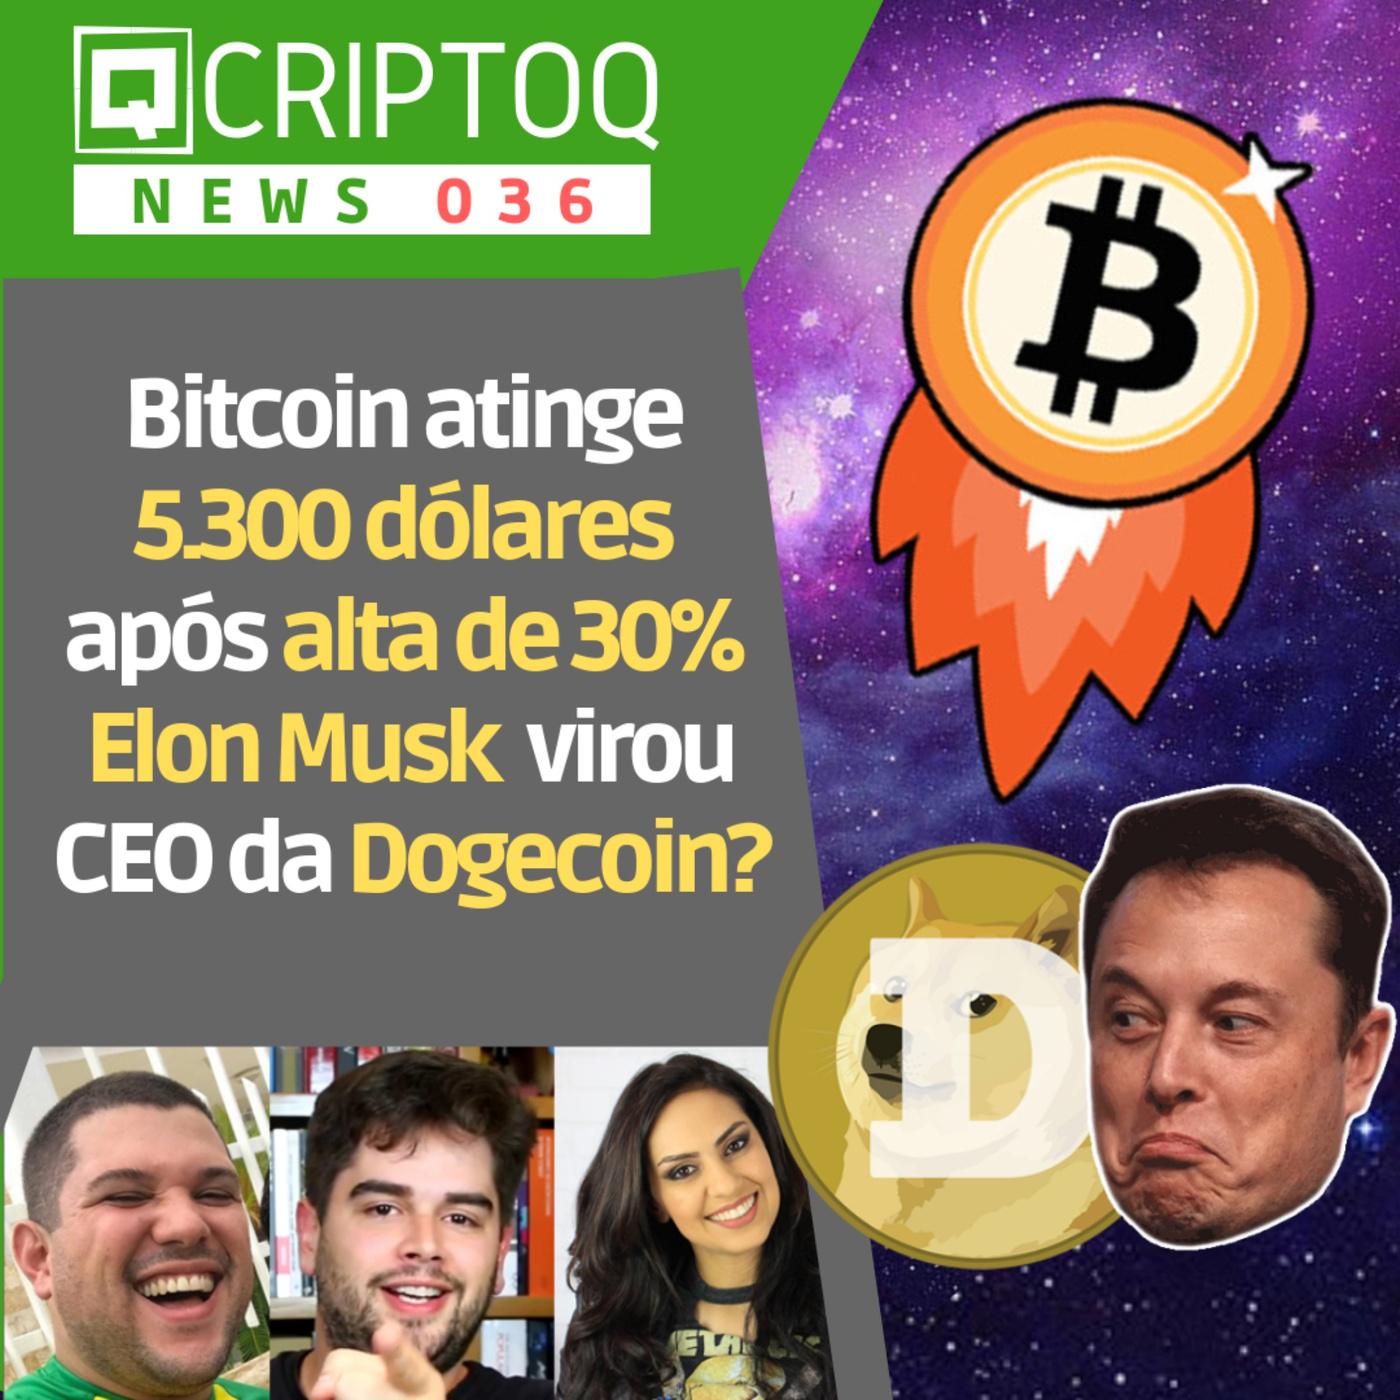 Bitcoin atinge USD 5.300 após alta de 30% e Elon Musk CEO da Dogecoin? CriptoQ News Podcast 036